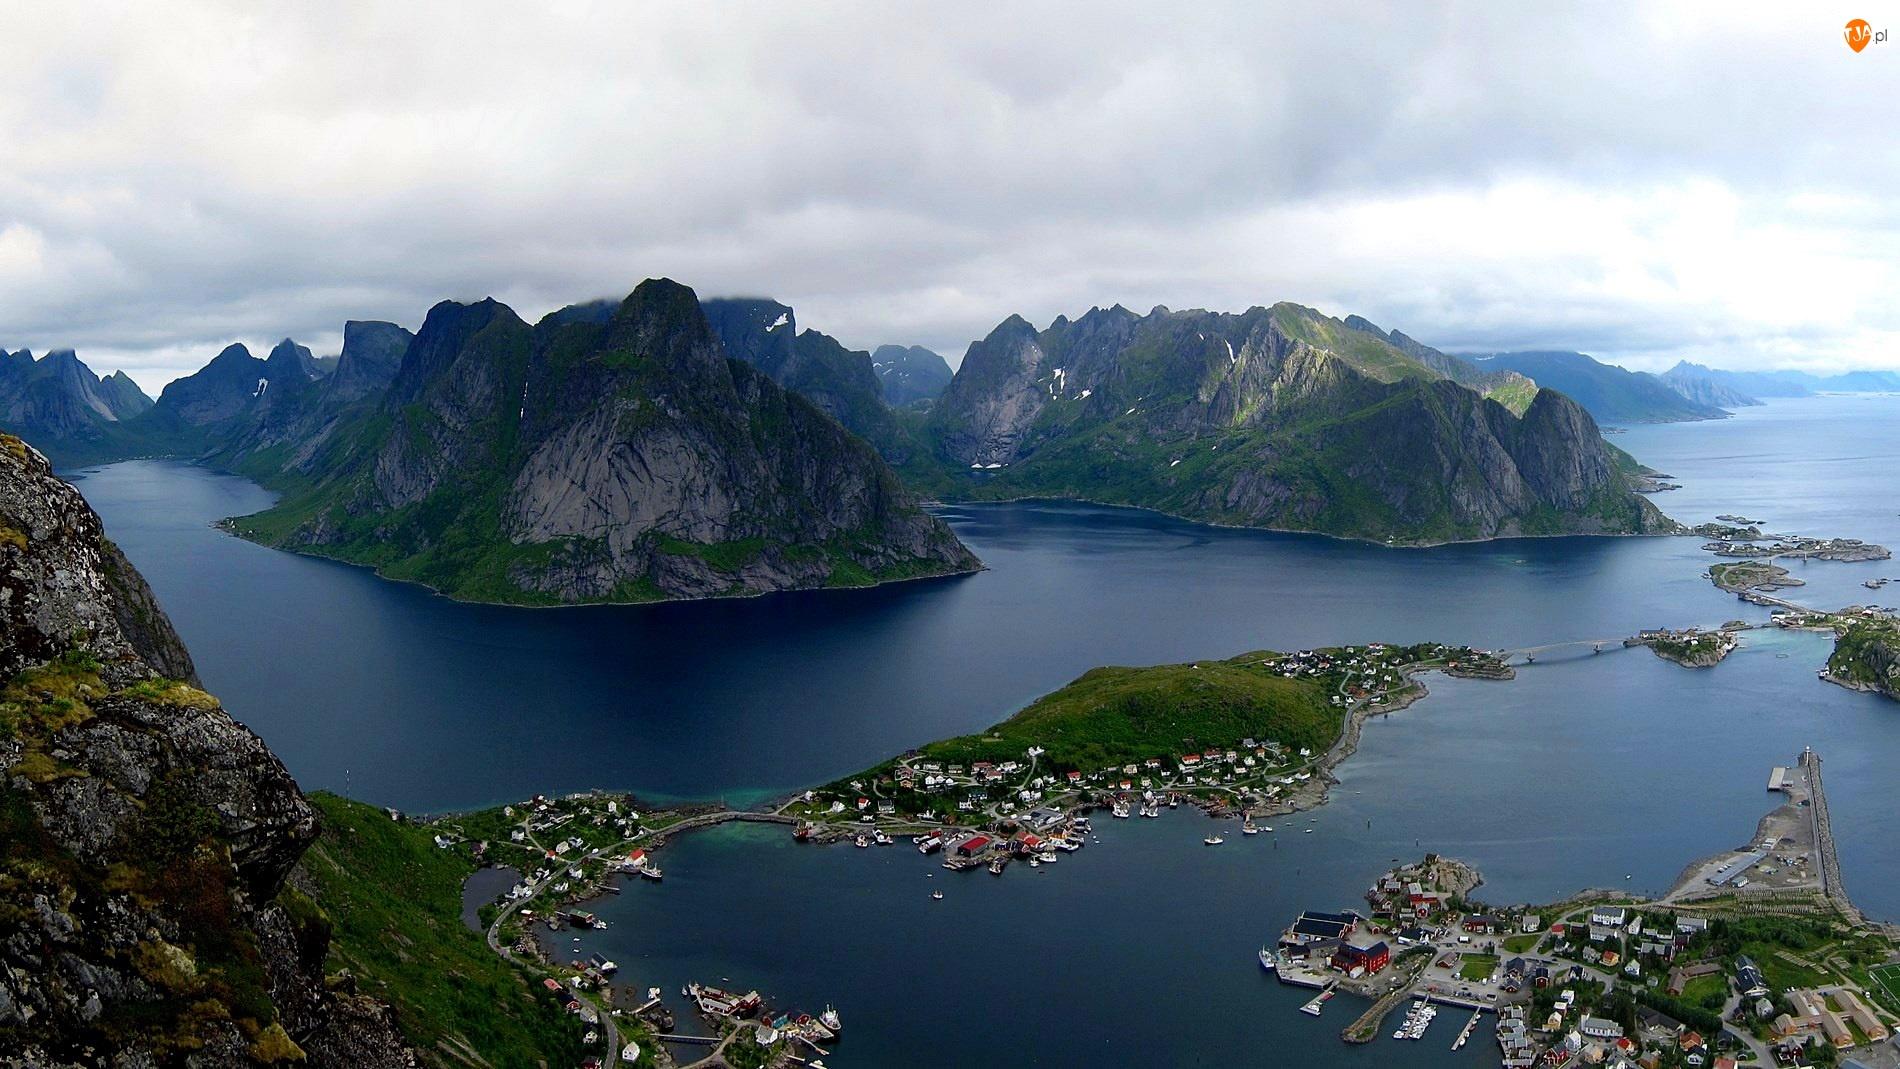 Norwegia, Góry, Lofoty, Morze